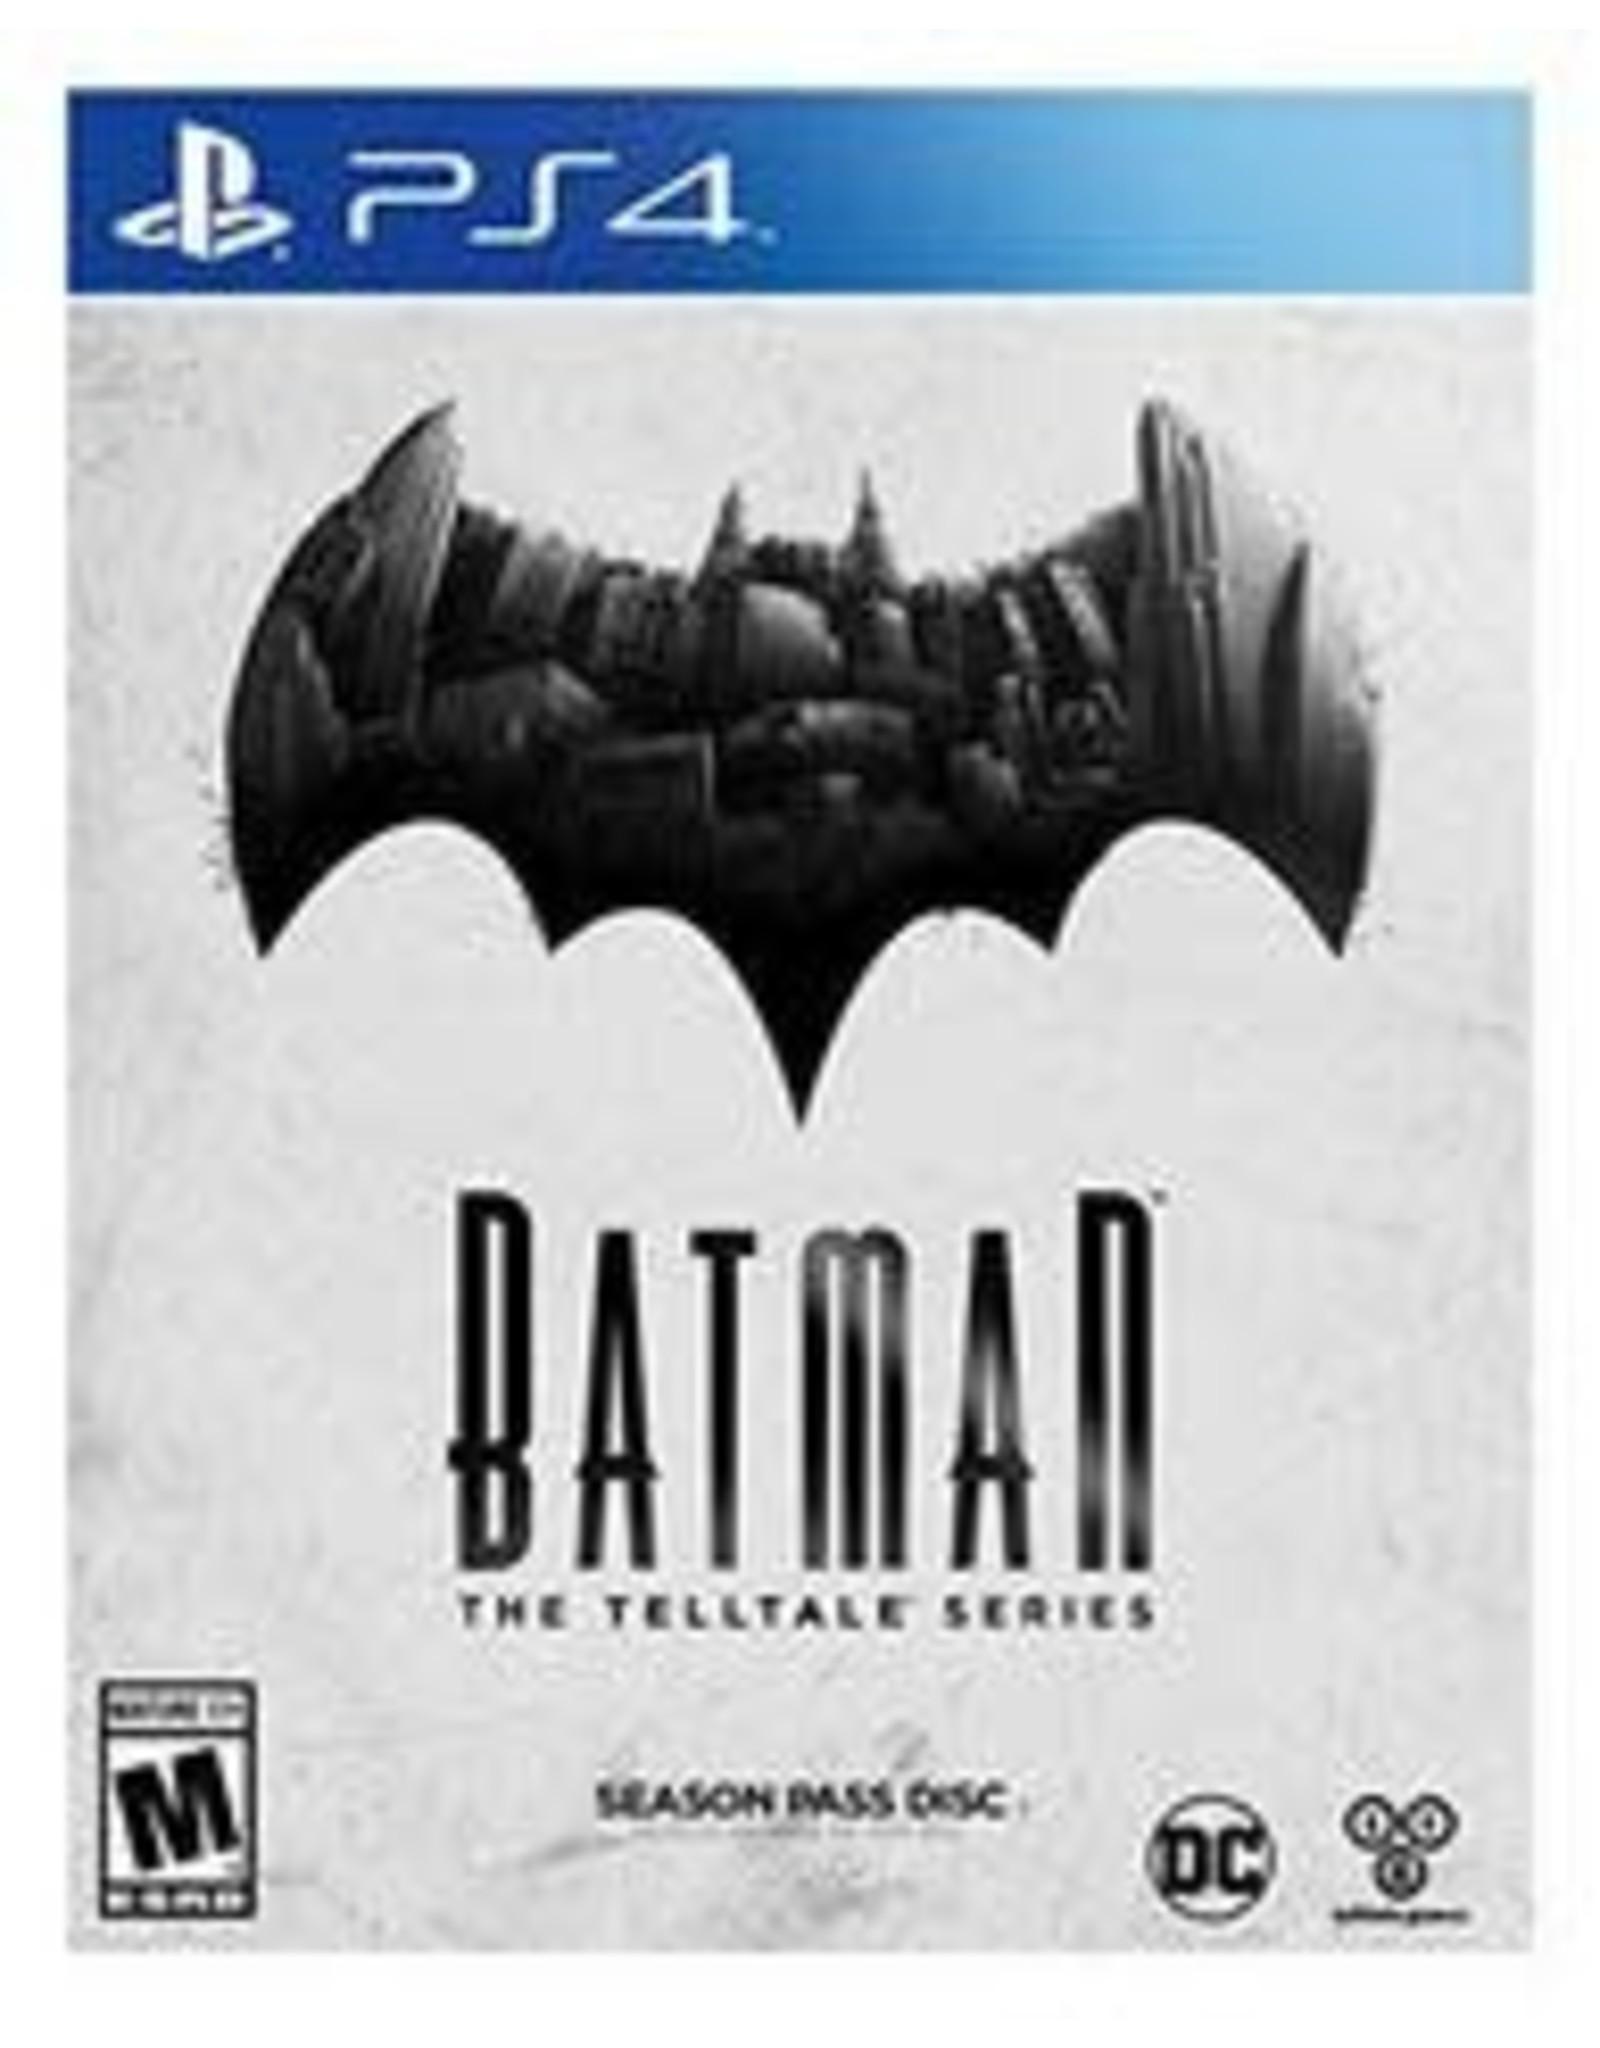 Playstation 4 Batman: The Telltale Series (Used)